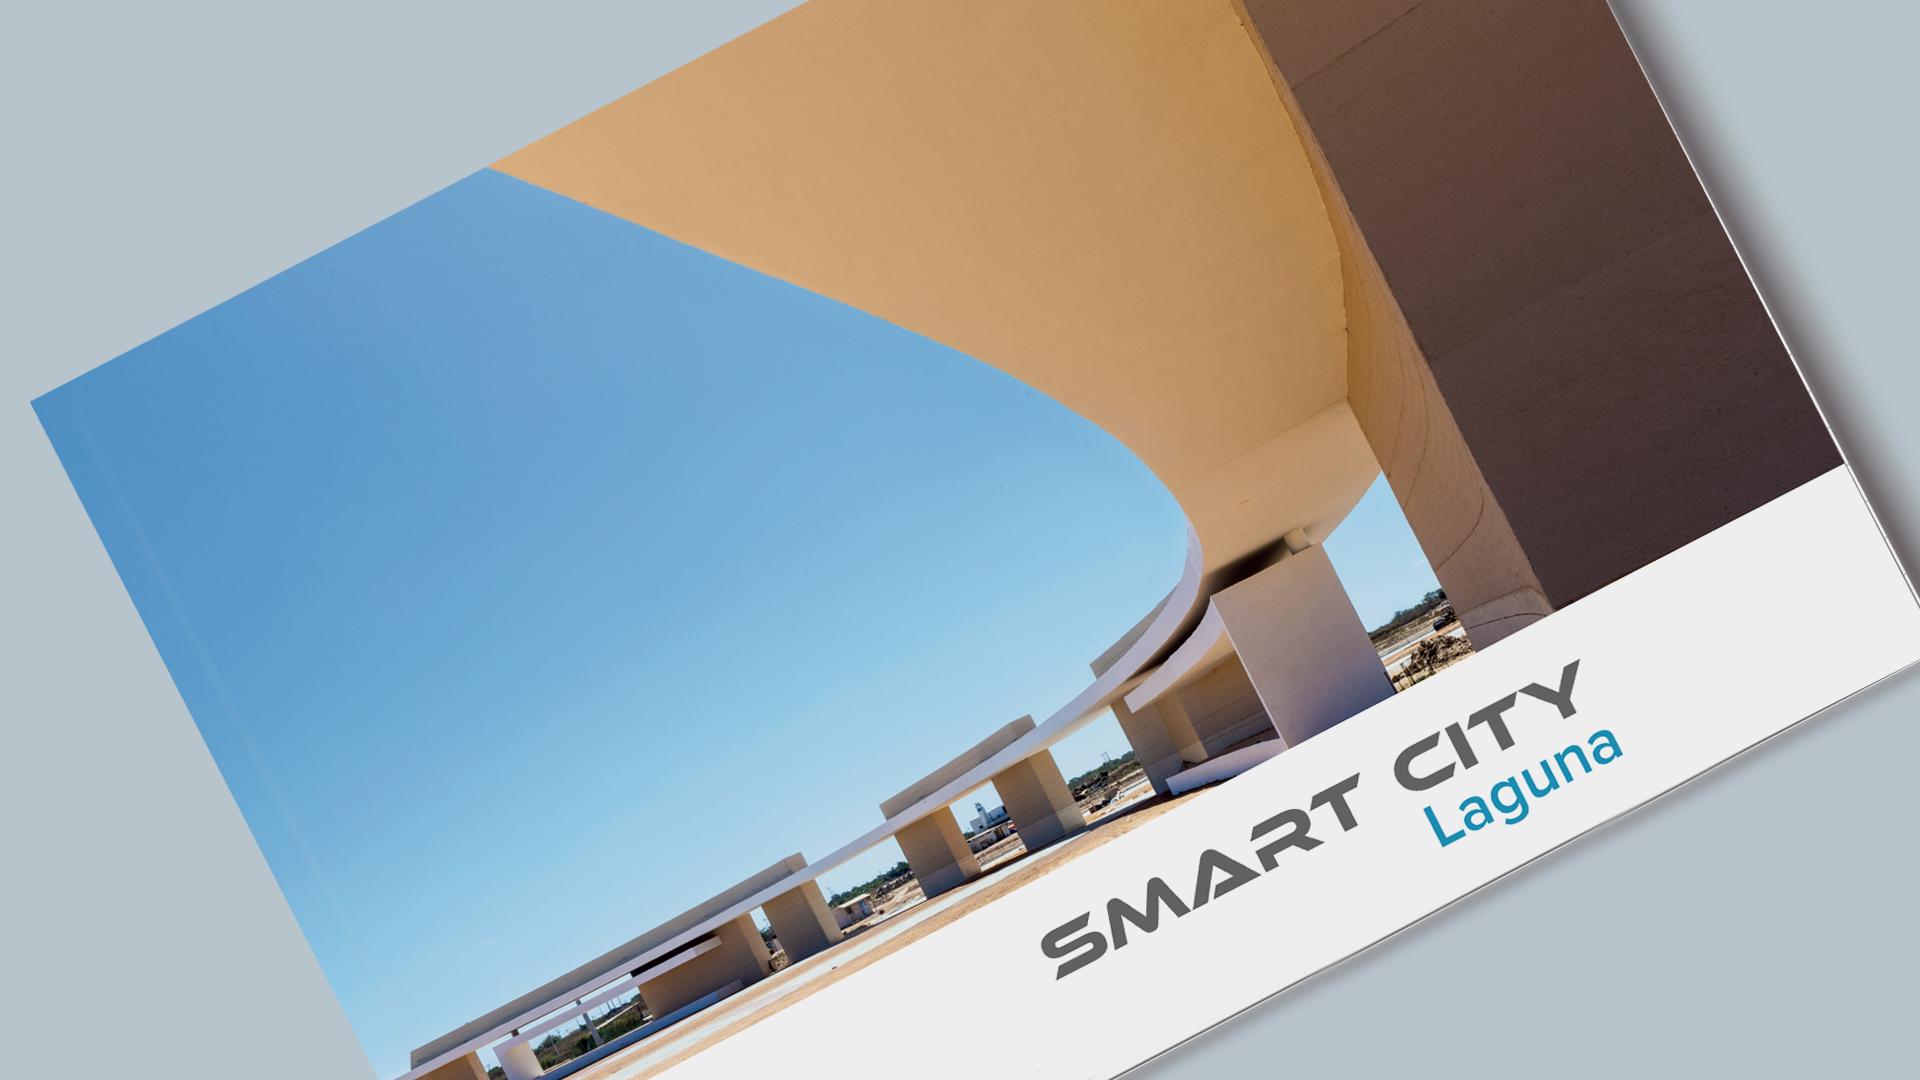 Smart City Laguna